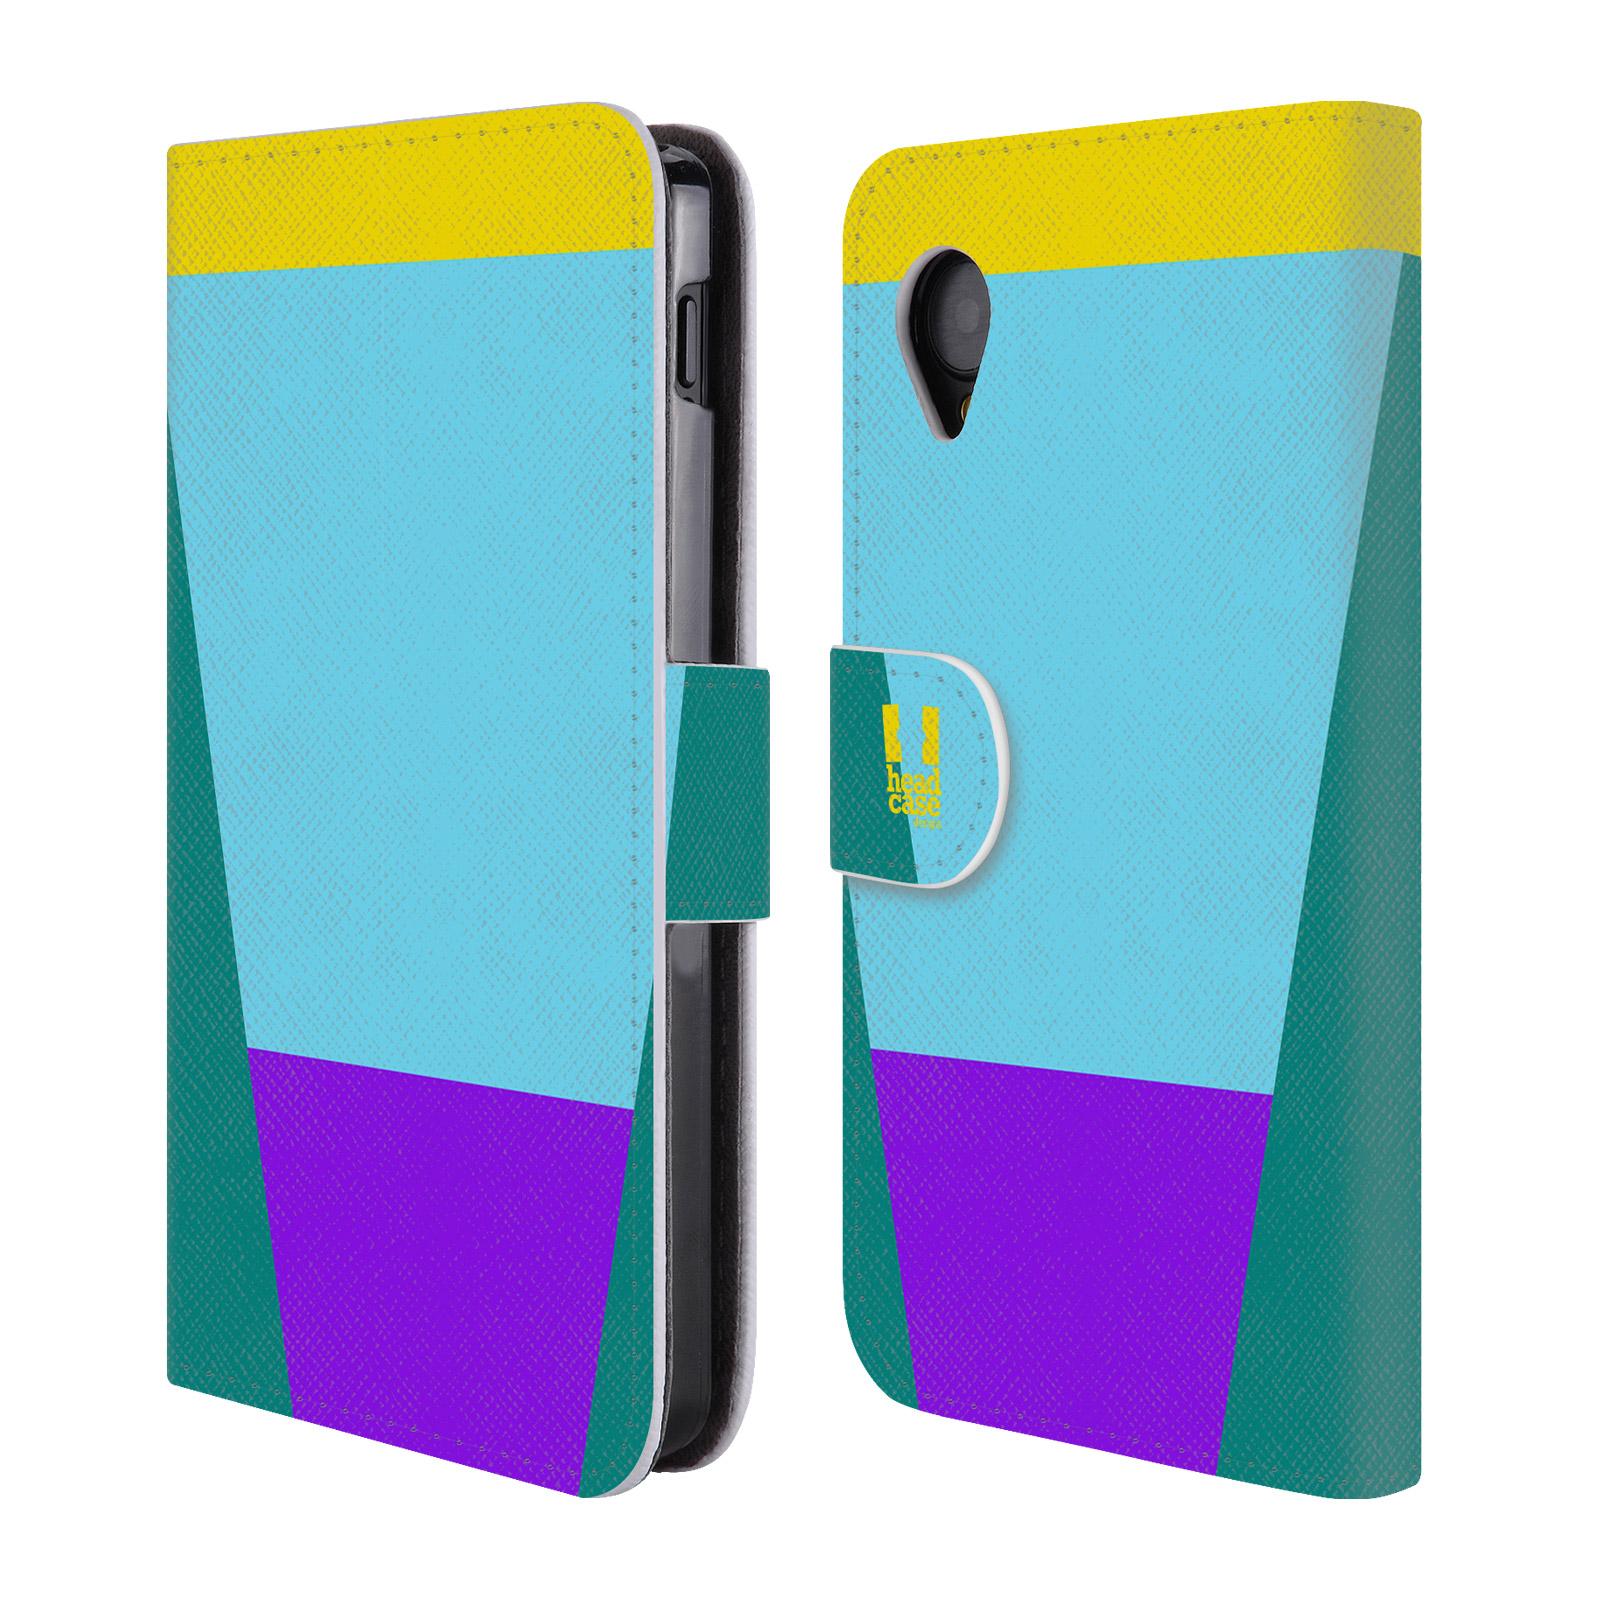 HEAD CASE Flipové pouzdro pro mobil LG GOOGLE NEXUS 5 barevné tvary nebesky modrá